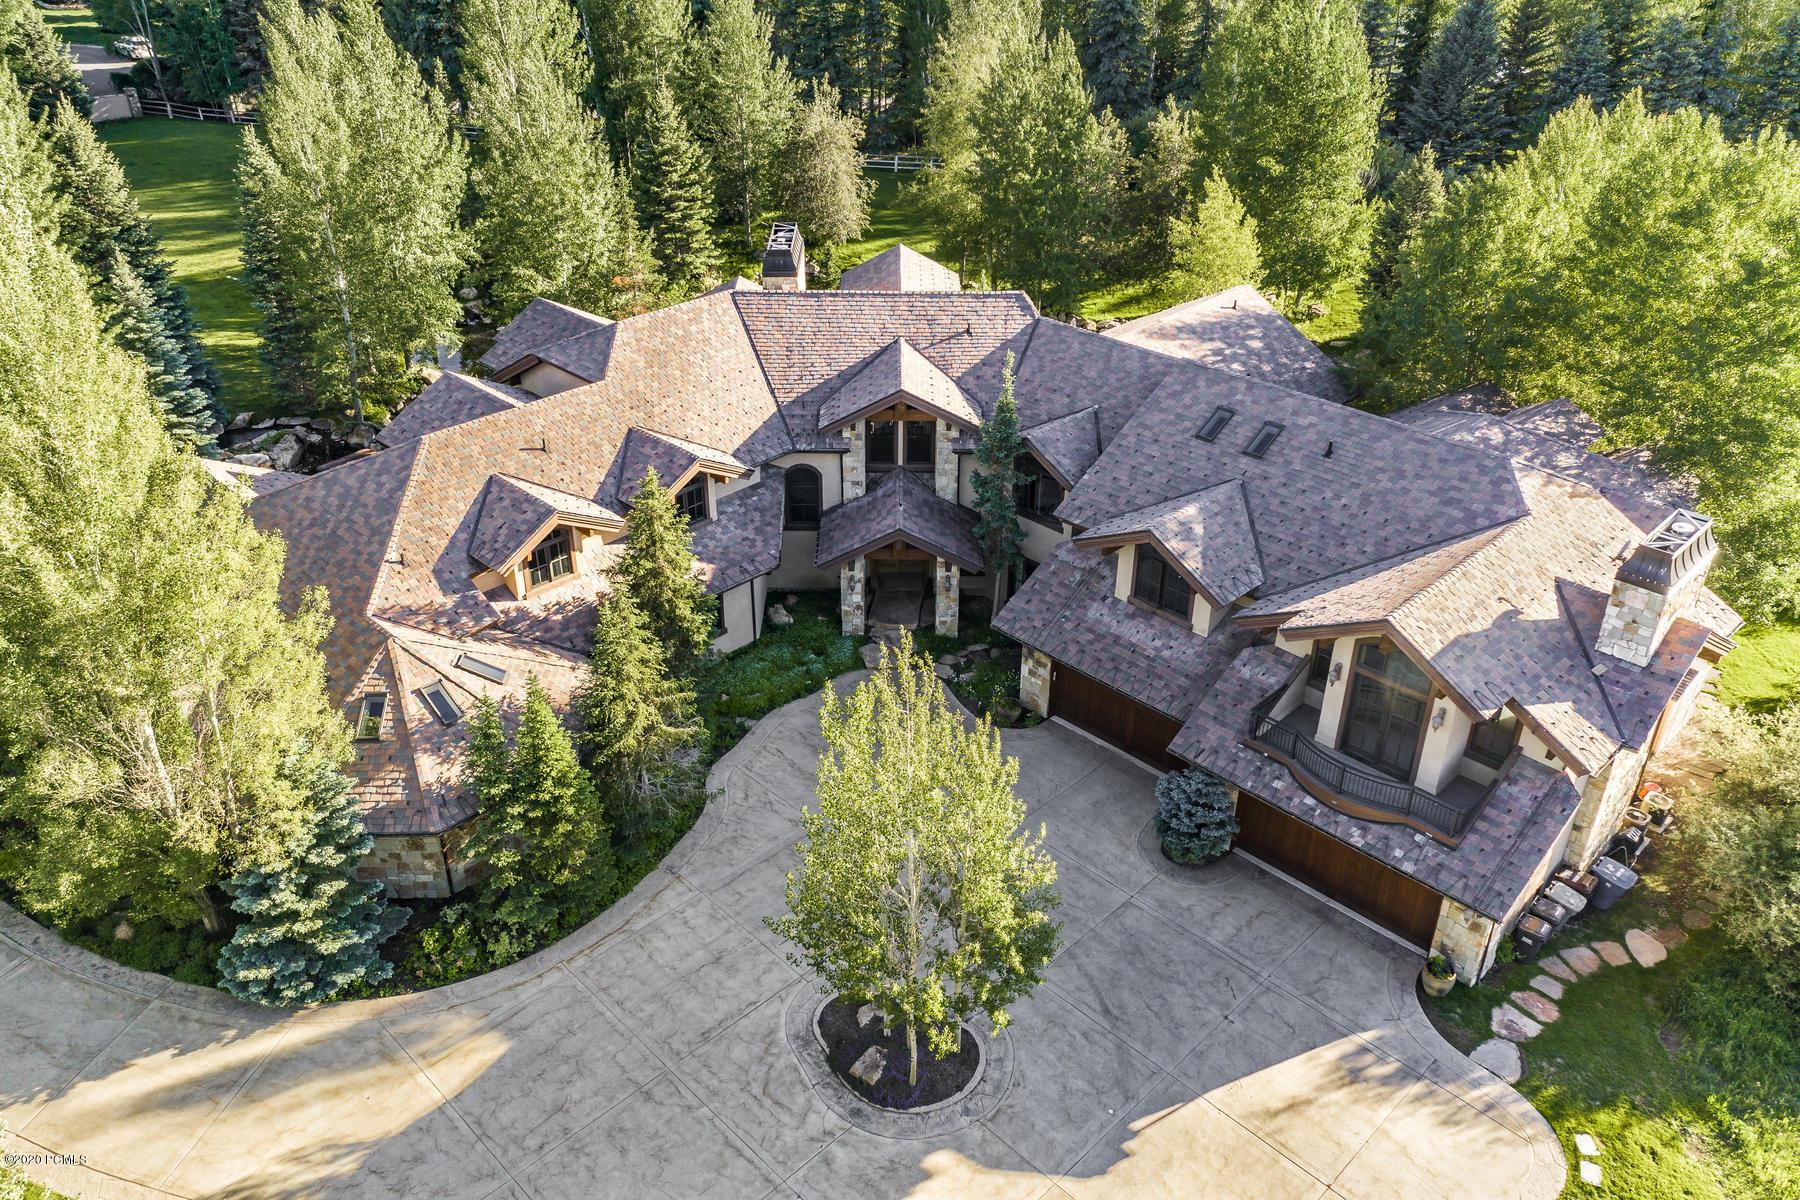 2750 Meadow Creek Drive, Park City, Utah 84060, 6 Bedrooms Bedrooms, ,8 BathroomsBathrooms,Single Family,For Sale,Meadow Creek,20190109112430415765000000